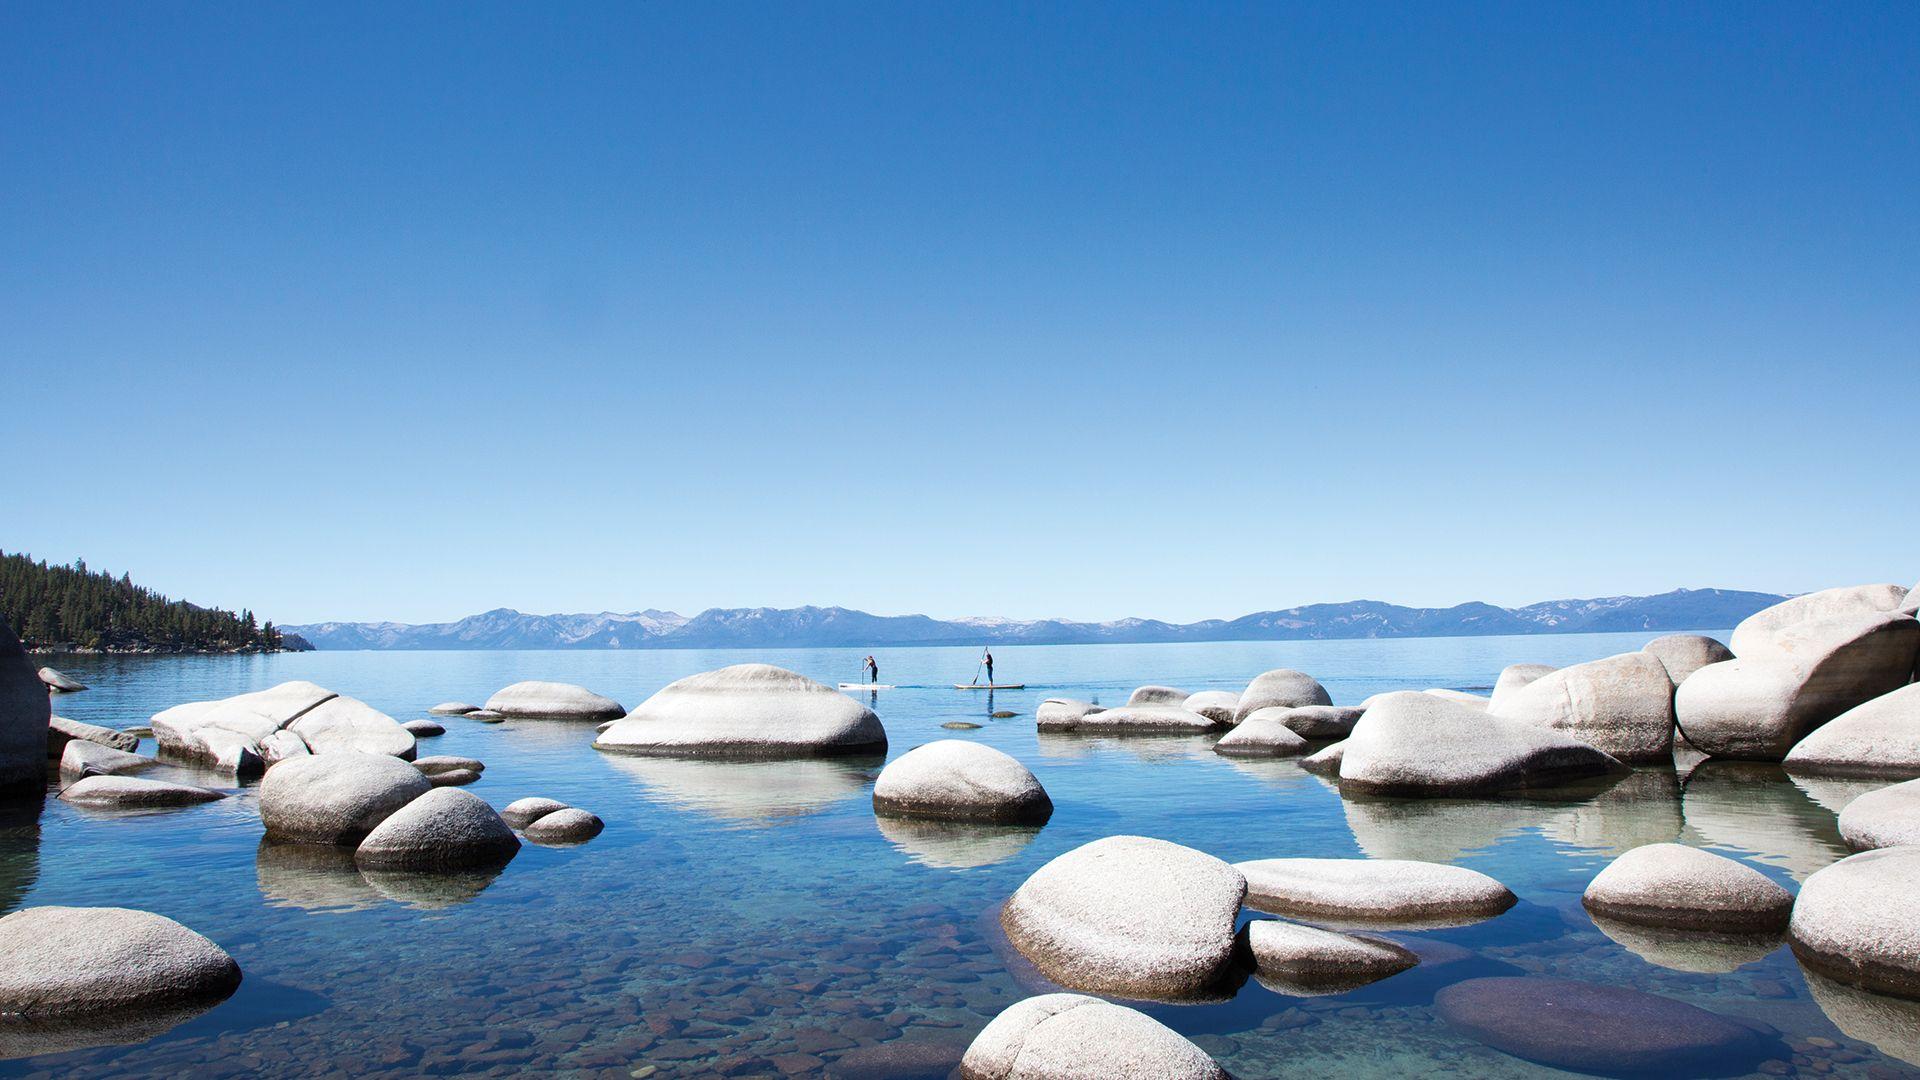 lake tahoe featured